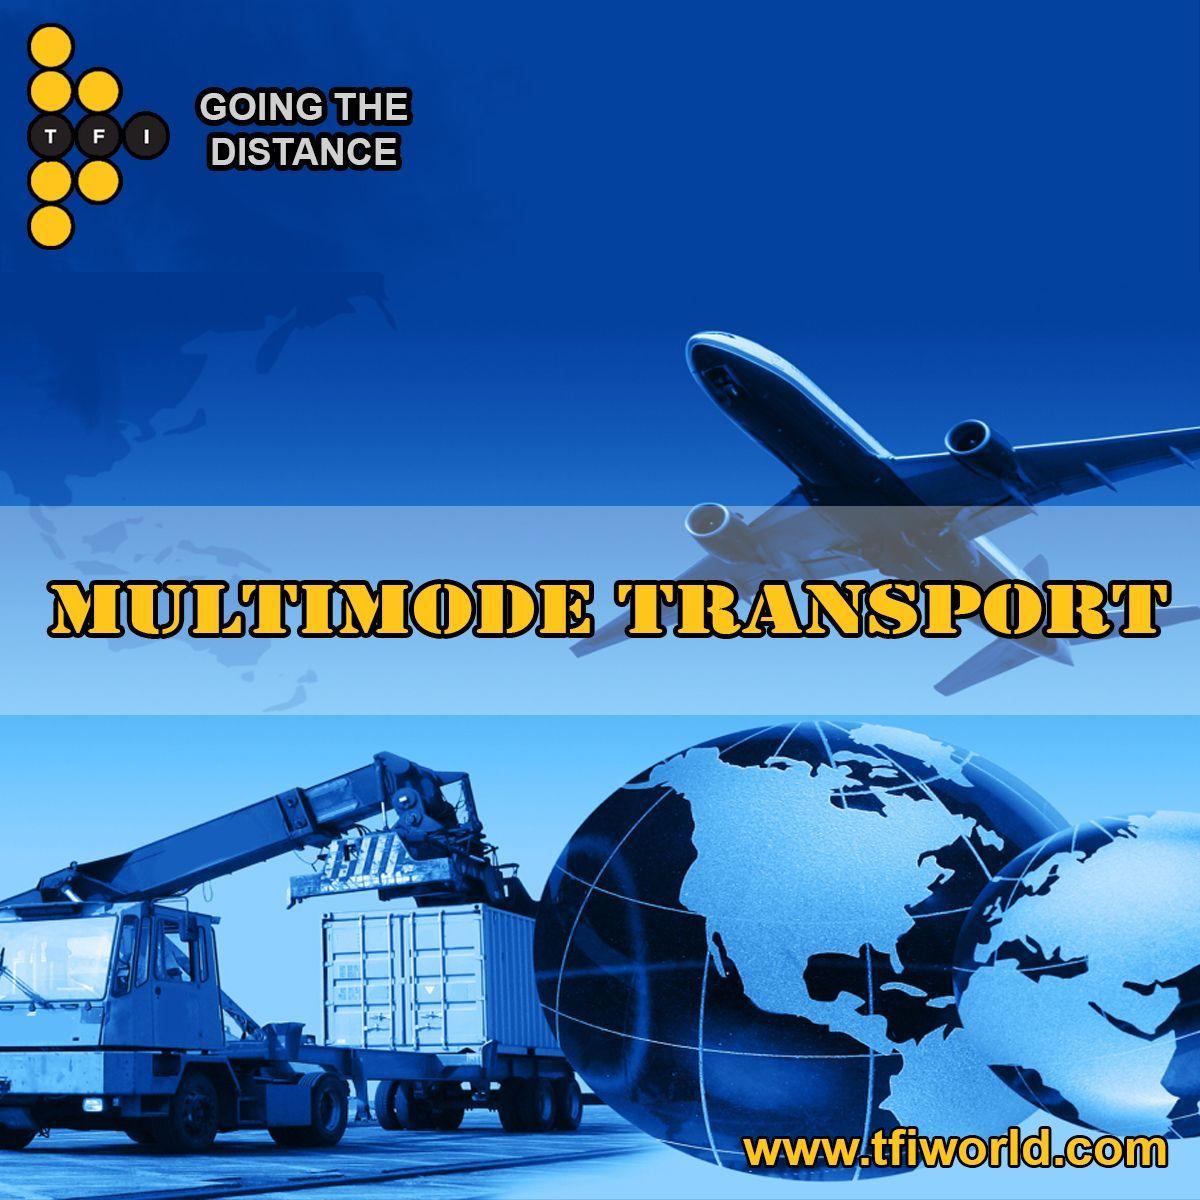 Exhibition Logistics Services in